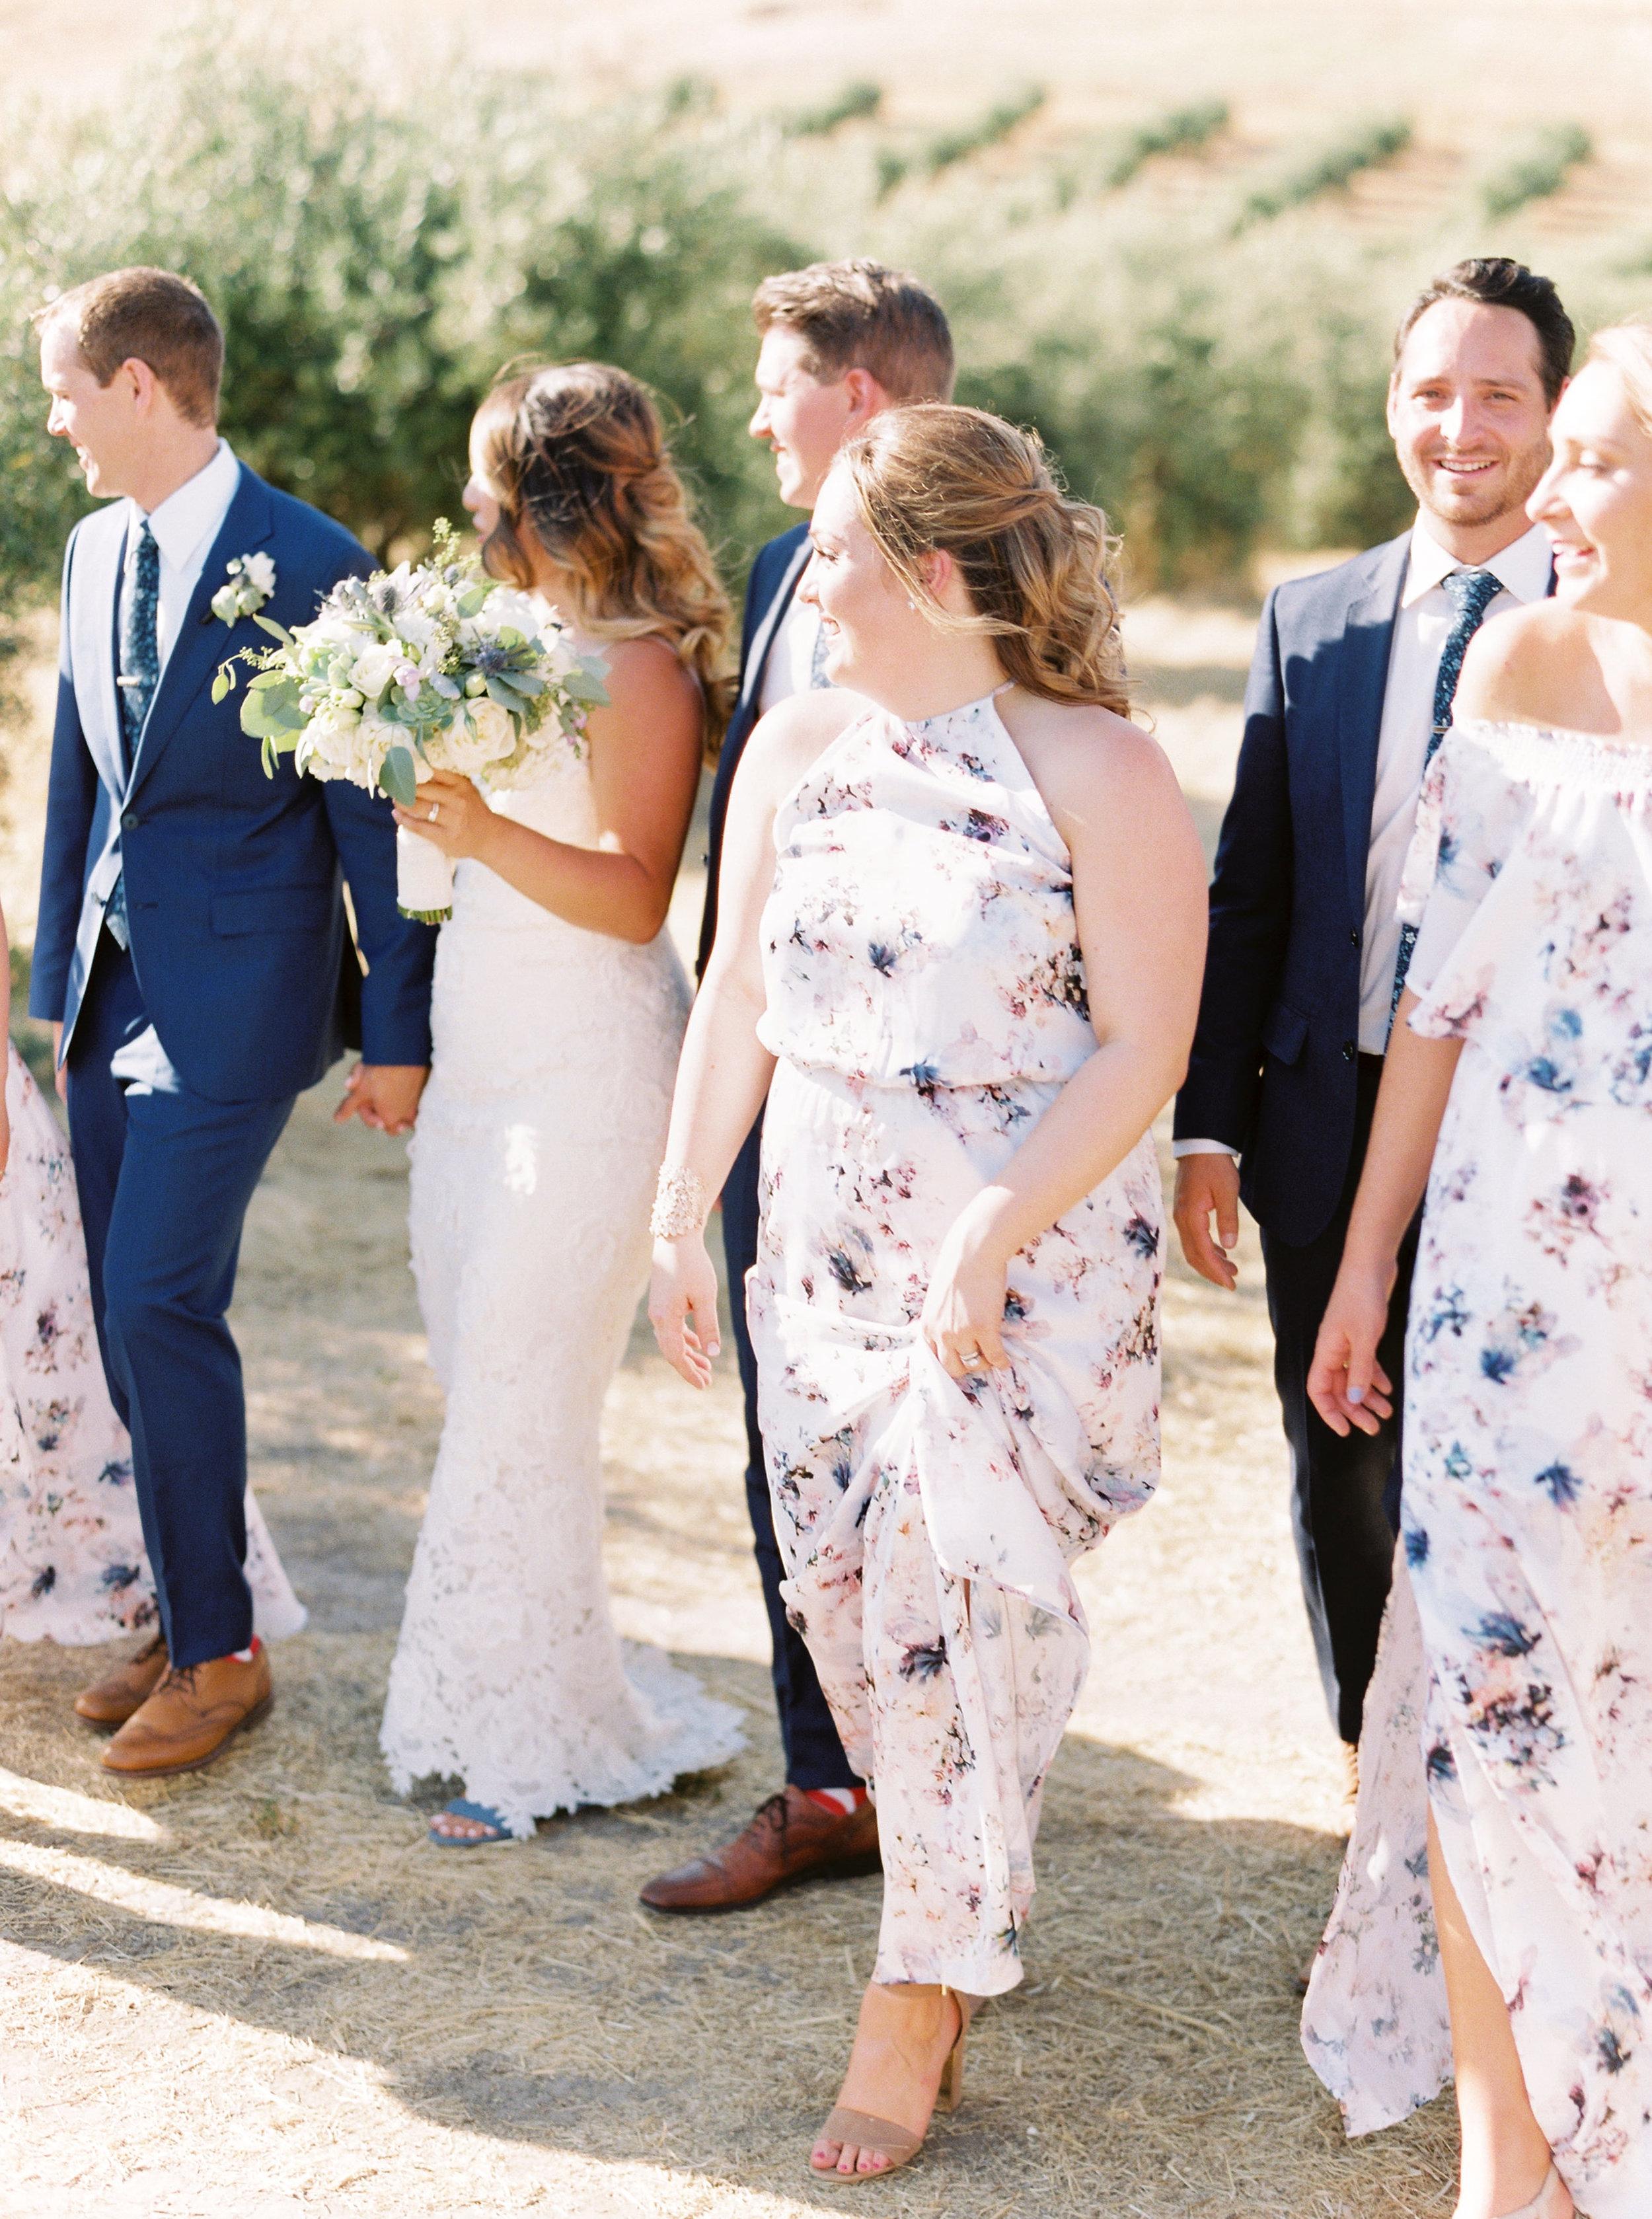 the-purple-orchid-resort-wedding-in-livermore-california-104.jpg